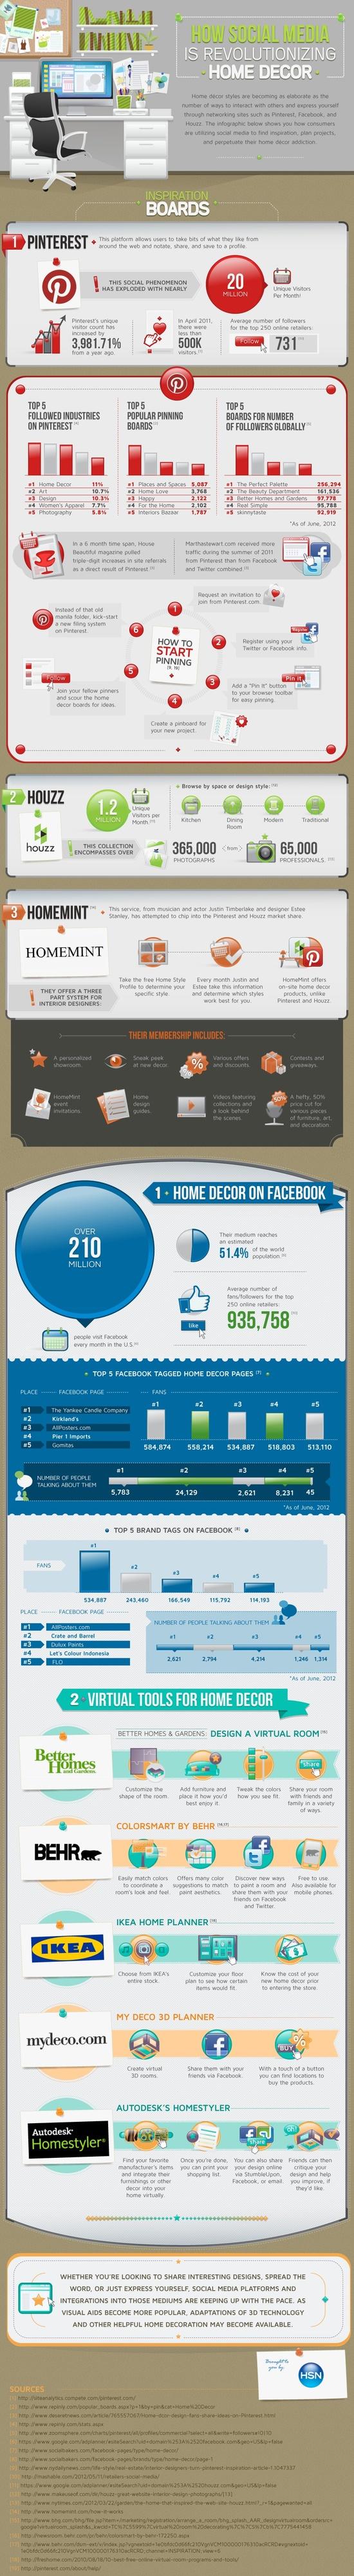 Home Decor and Social Media